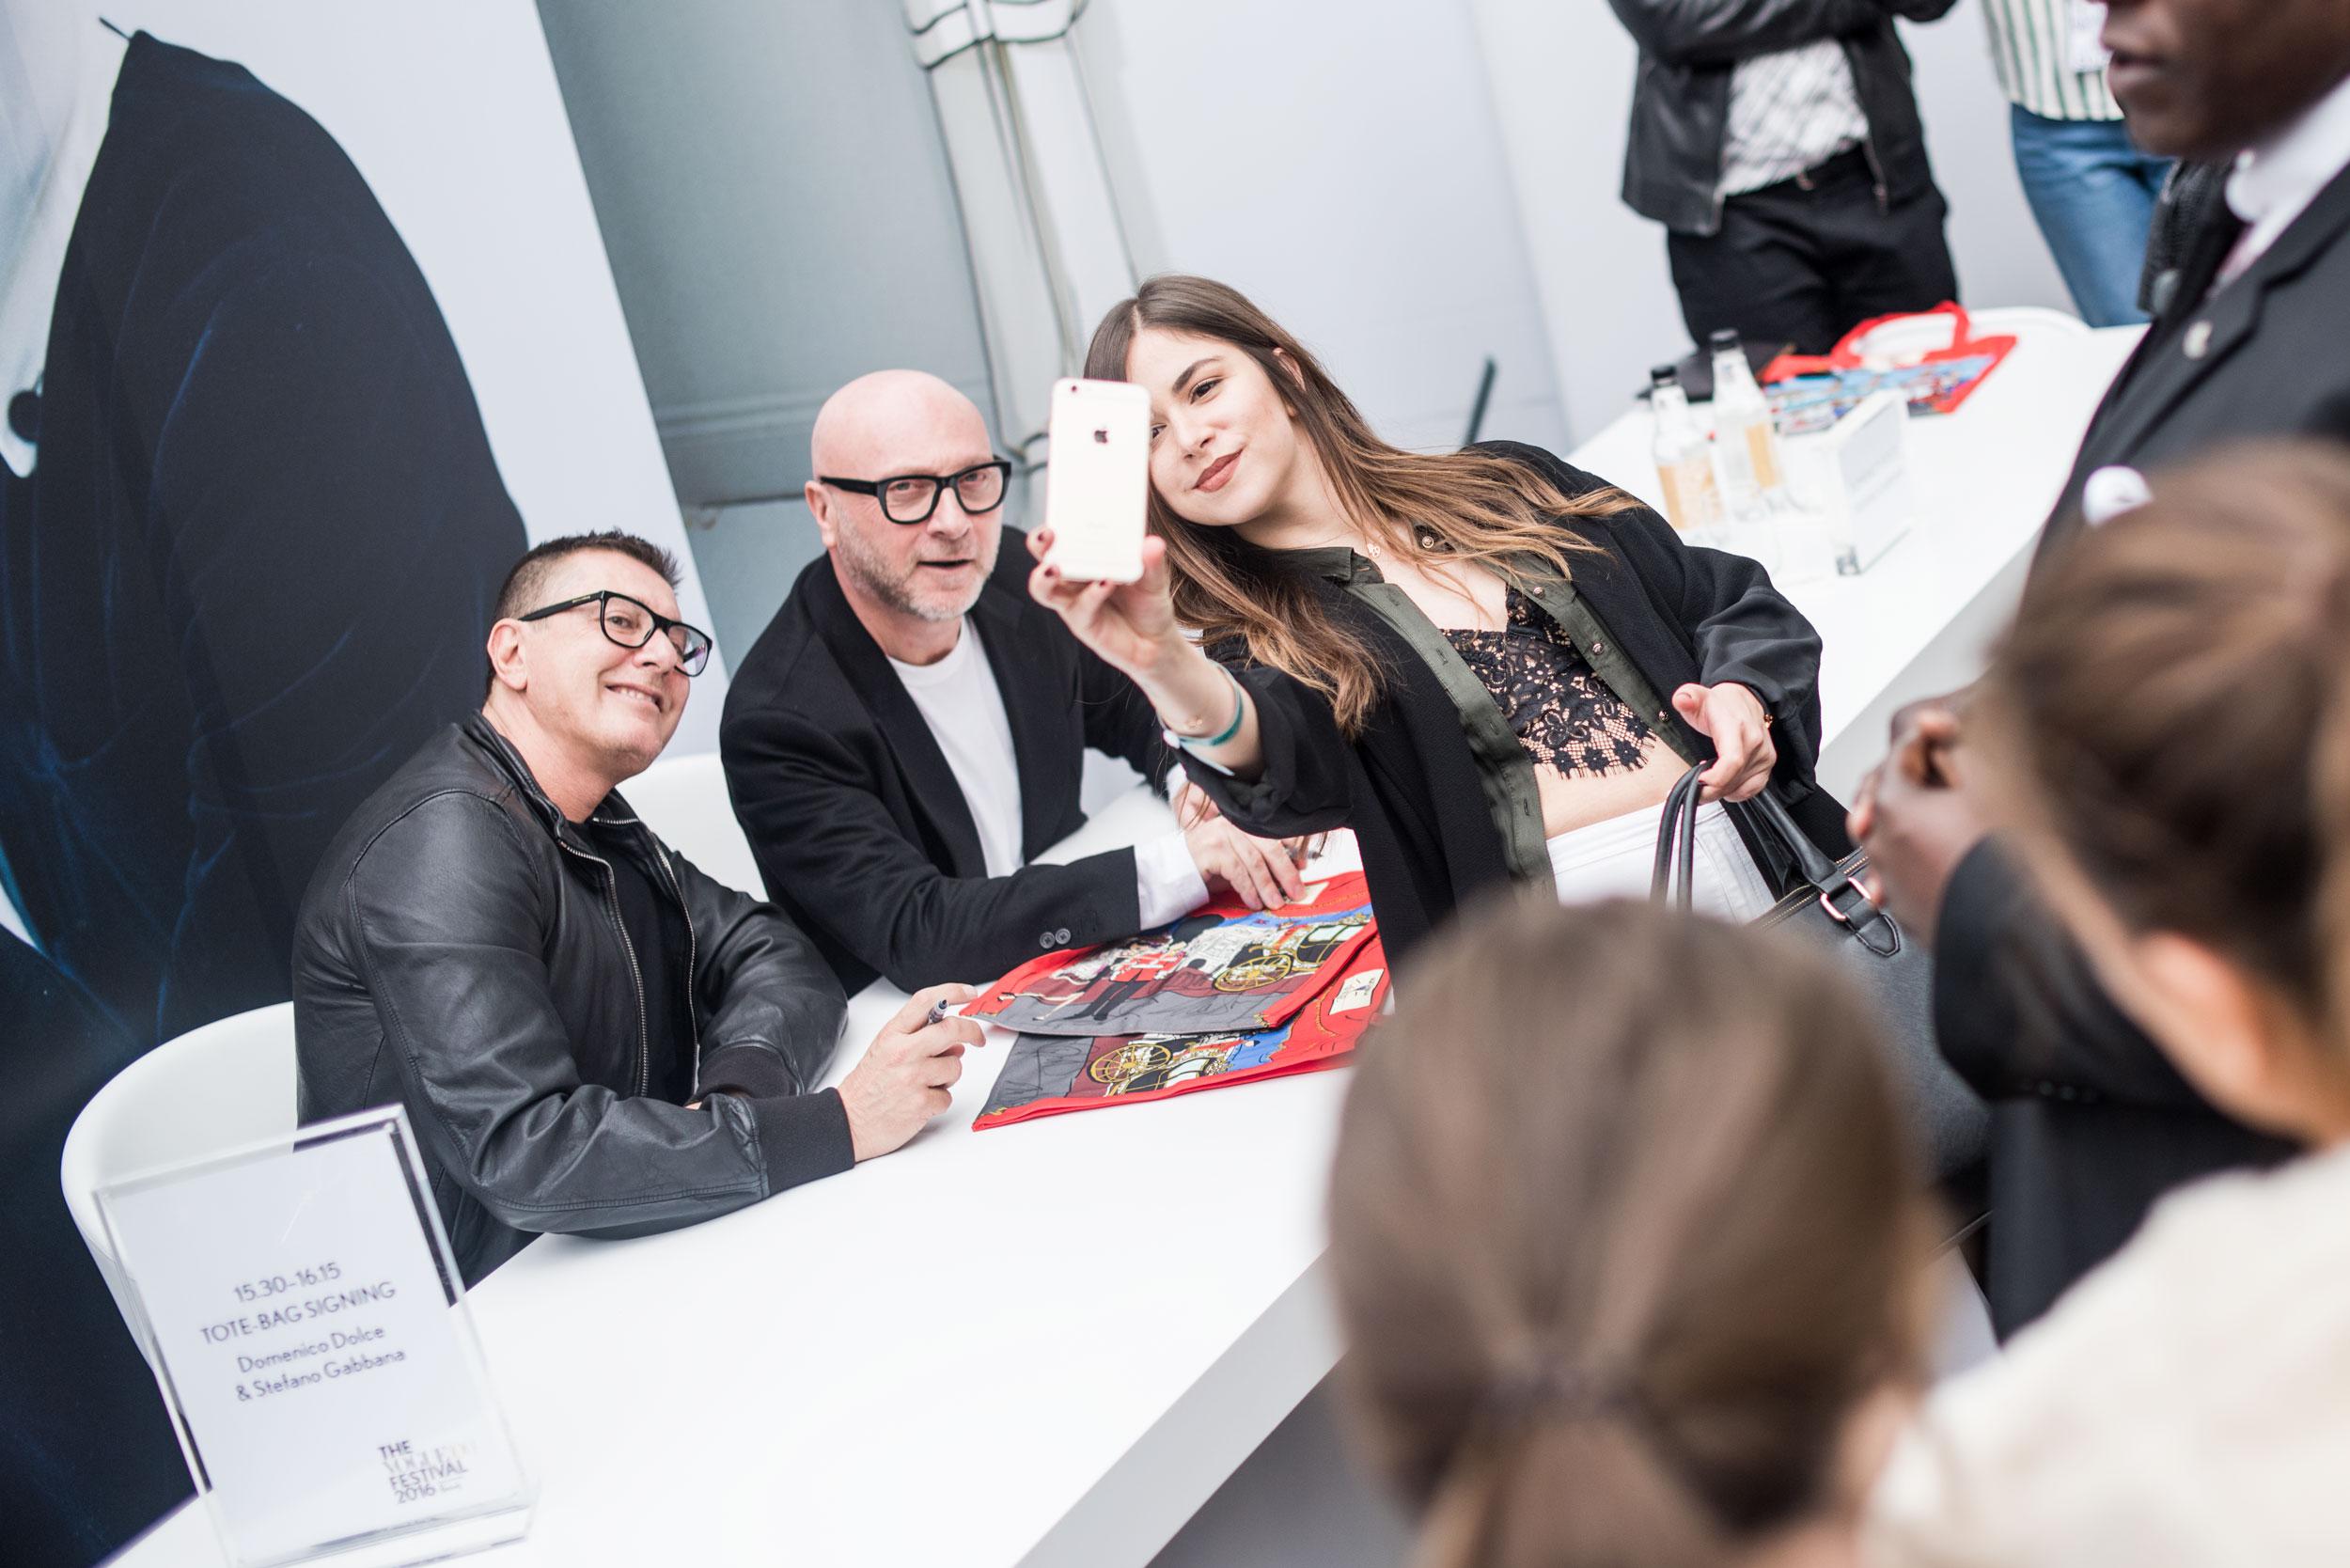 Domenico Dolce and Stefano Gabbana at Vogue Festival 2016